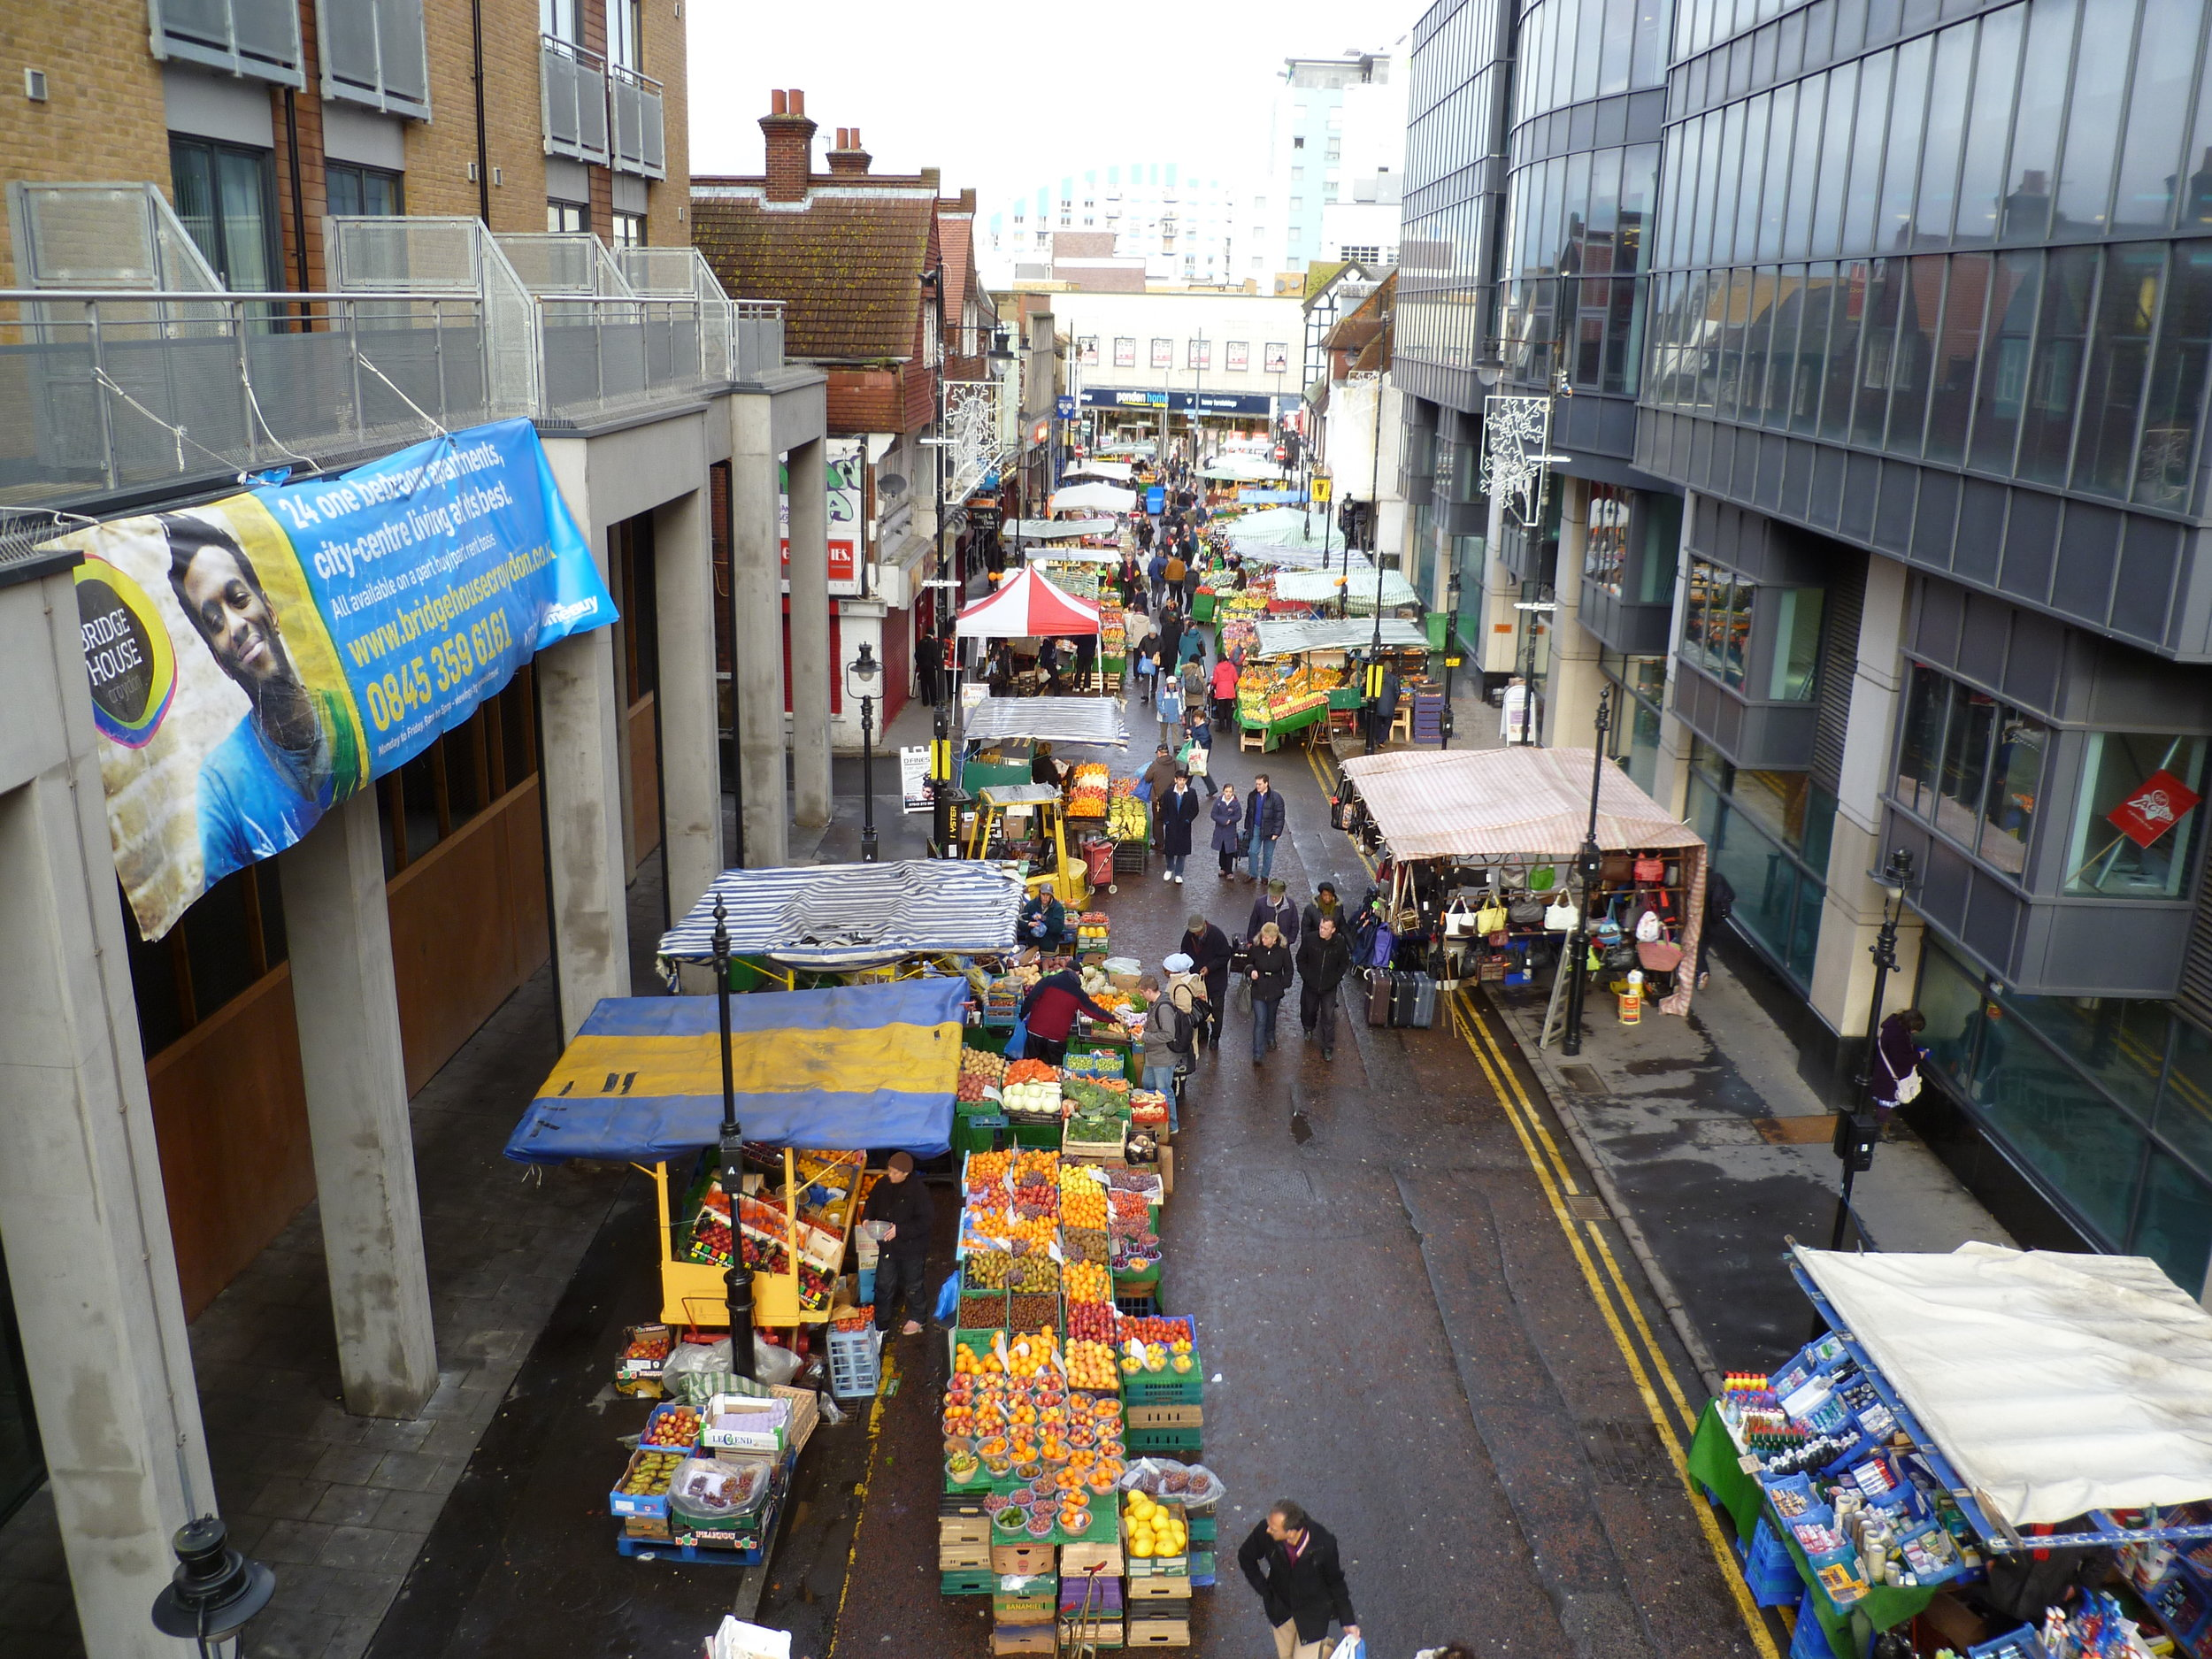 surrey street market south london club